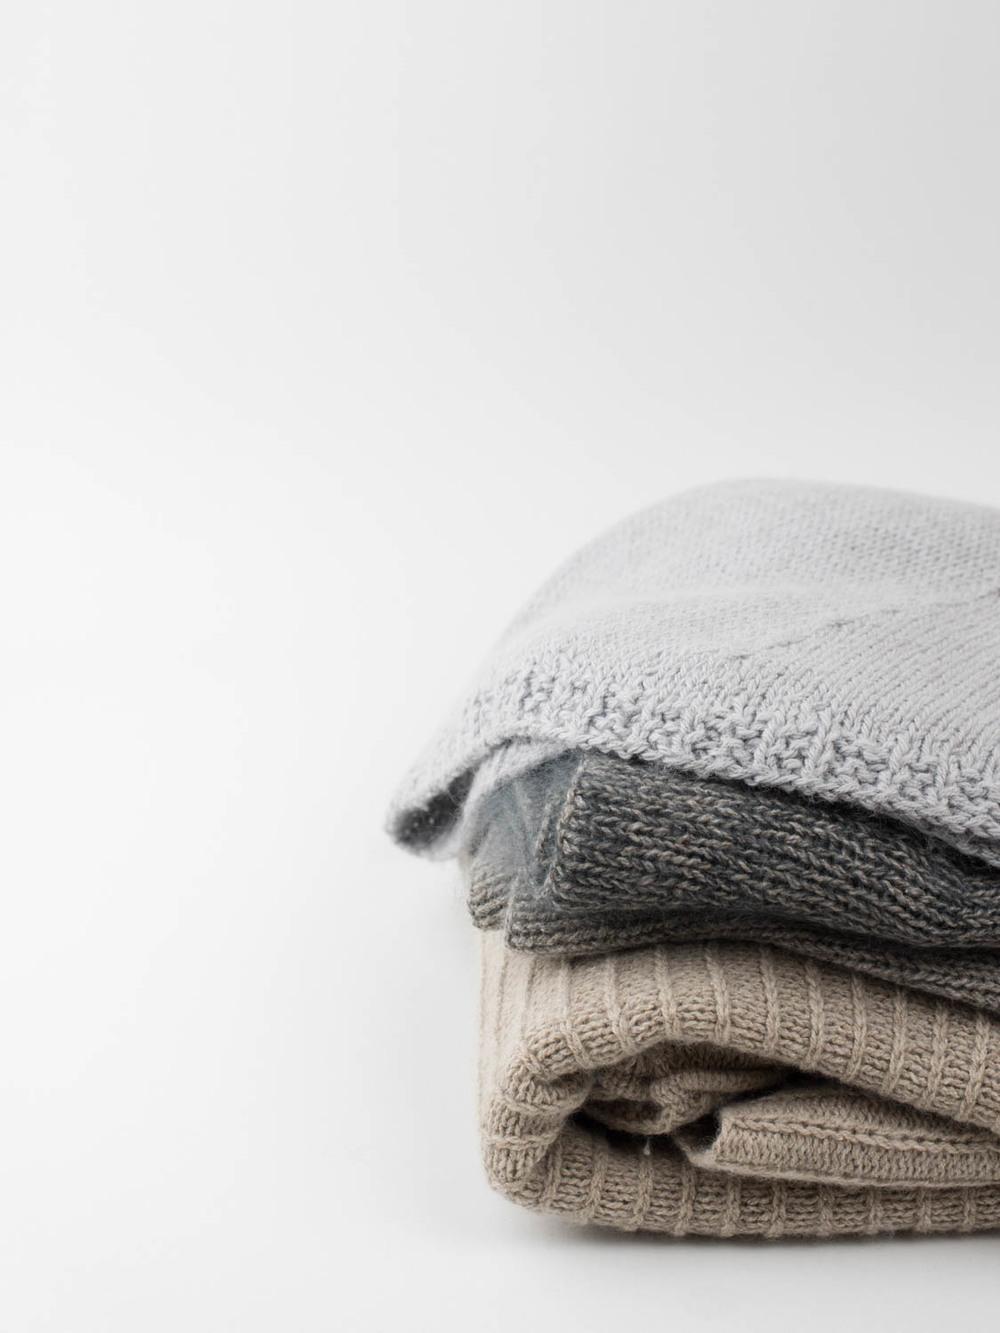 Shibui-Knits-Promo-Garment-2572.jpg